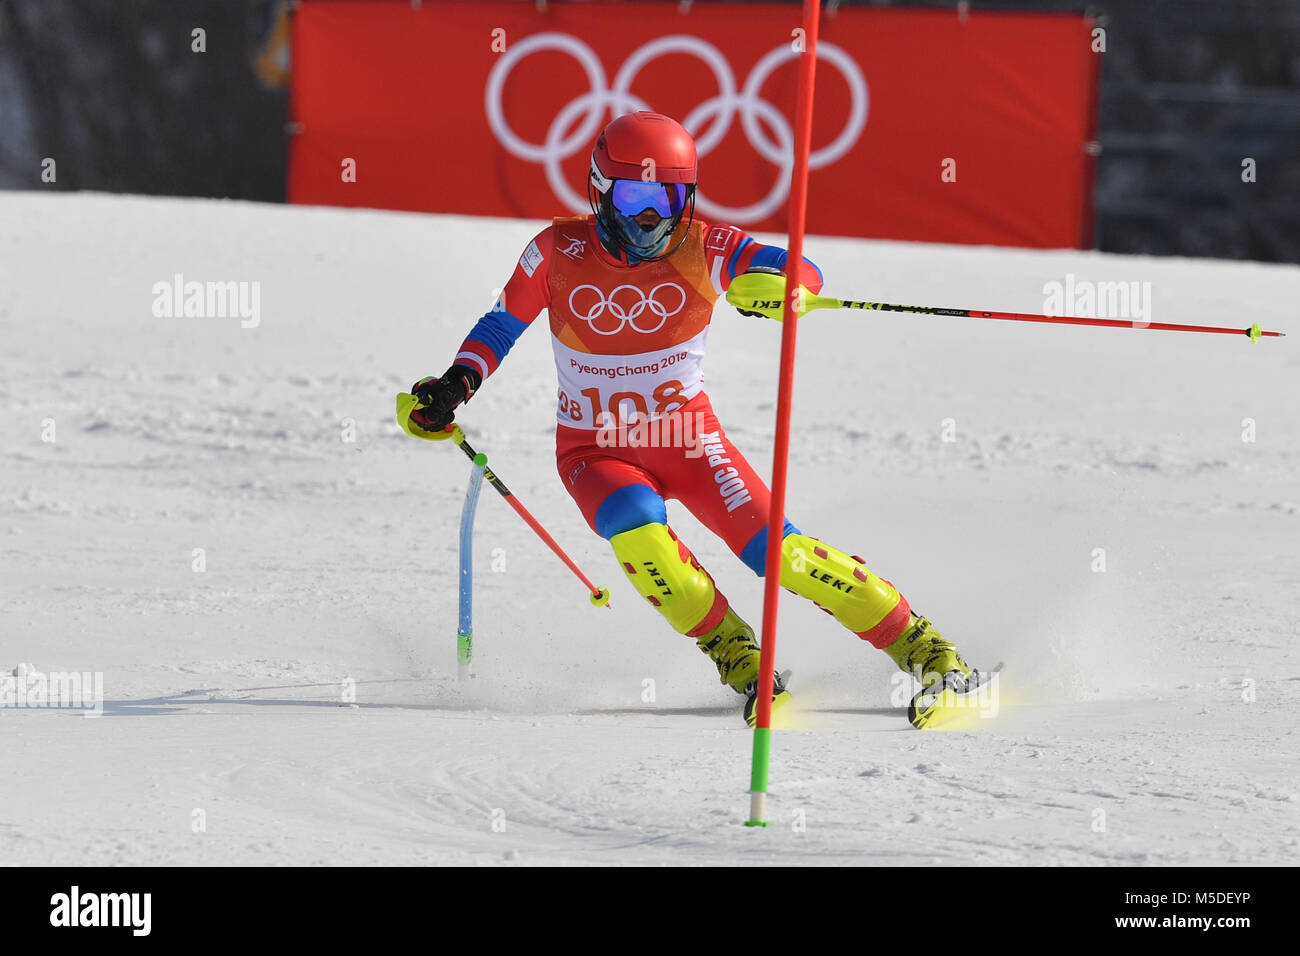 CHOE Myong Gwang (PRK), l'Aktion. Ski alpin, Slalom Hommes, ski alpin, Slalom der Herren am 22.02.2018 centre Photo Stock